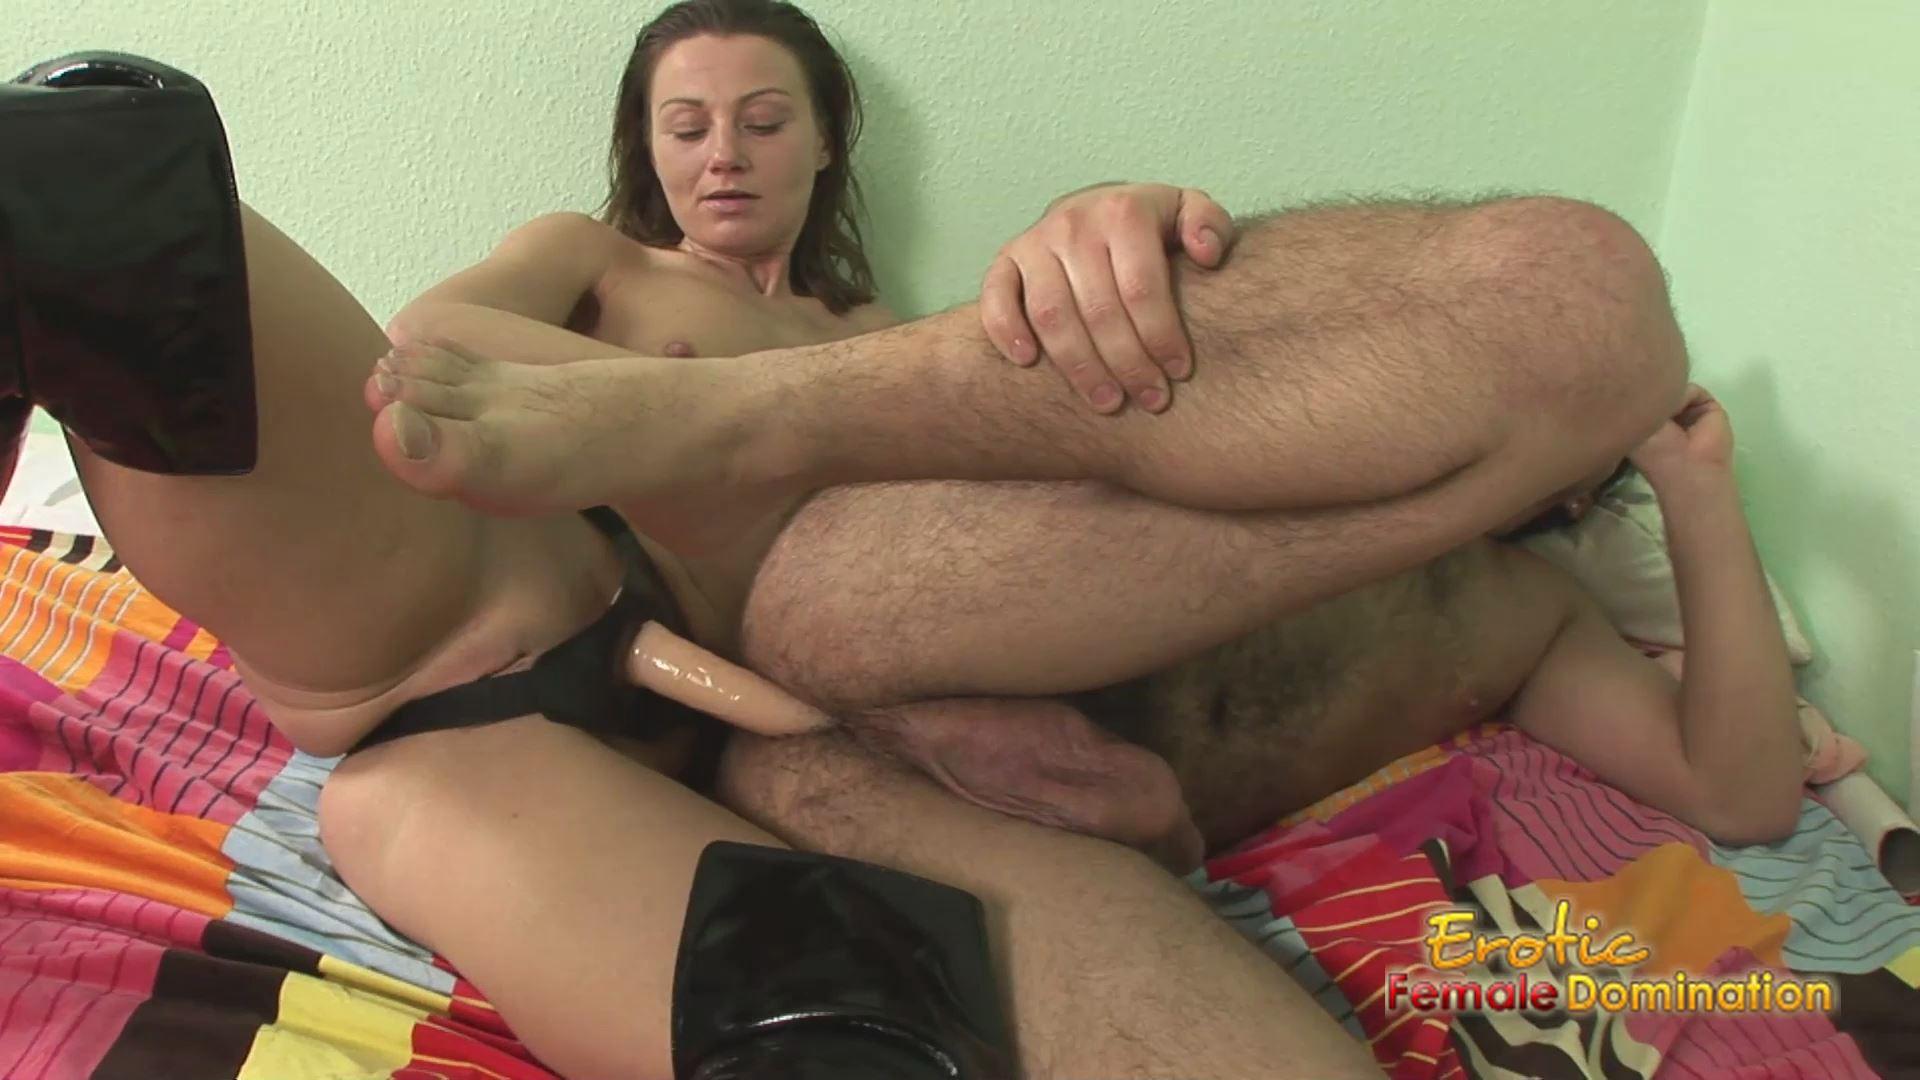 Sexy Dominatrix Pegs Her Slave's Asshole - EROTIC FEMALE DOMINATION - FULL HD/1080p/MP4